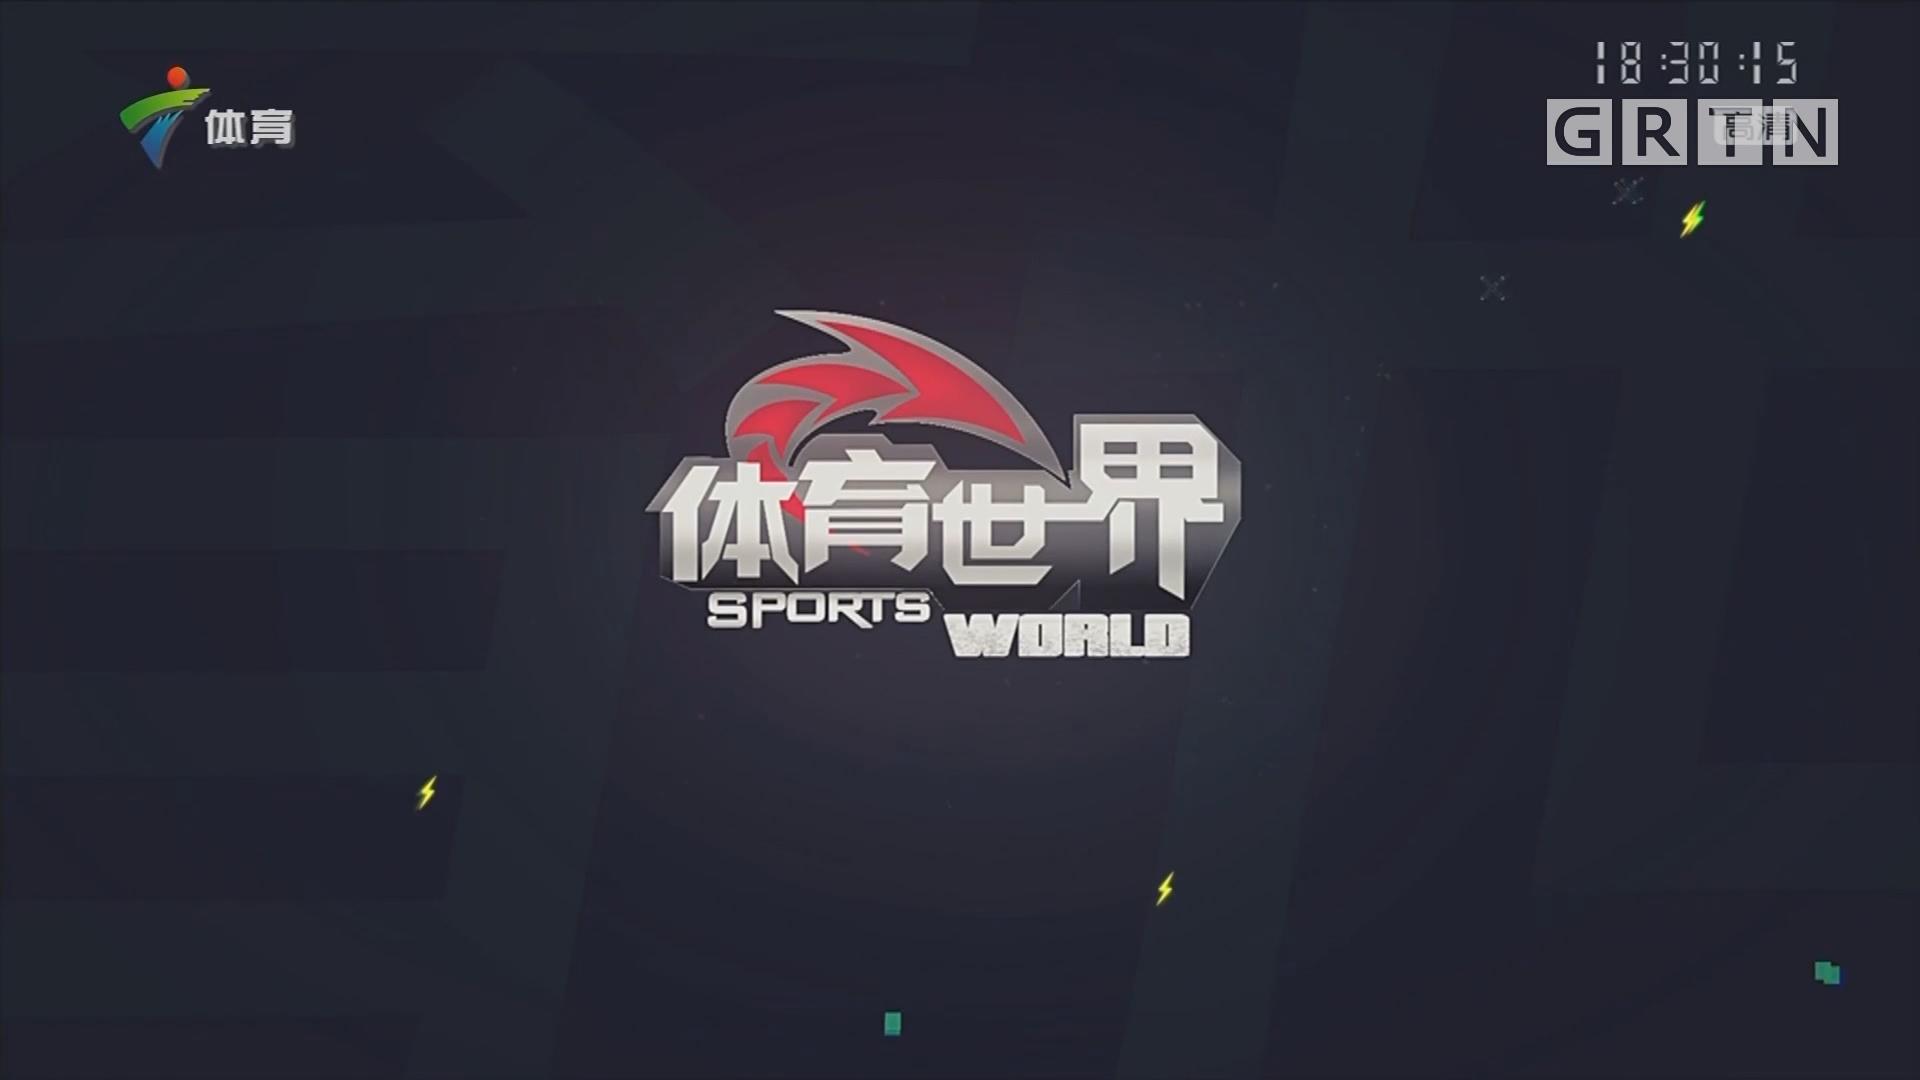 [HD][2018-11-20]体育世界:中国网球大奖赛正式拉开战幕 广东选手无缘开门红